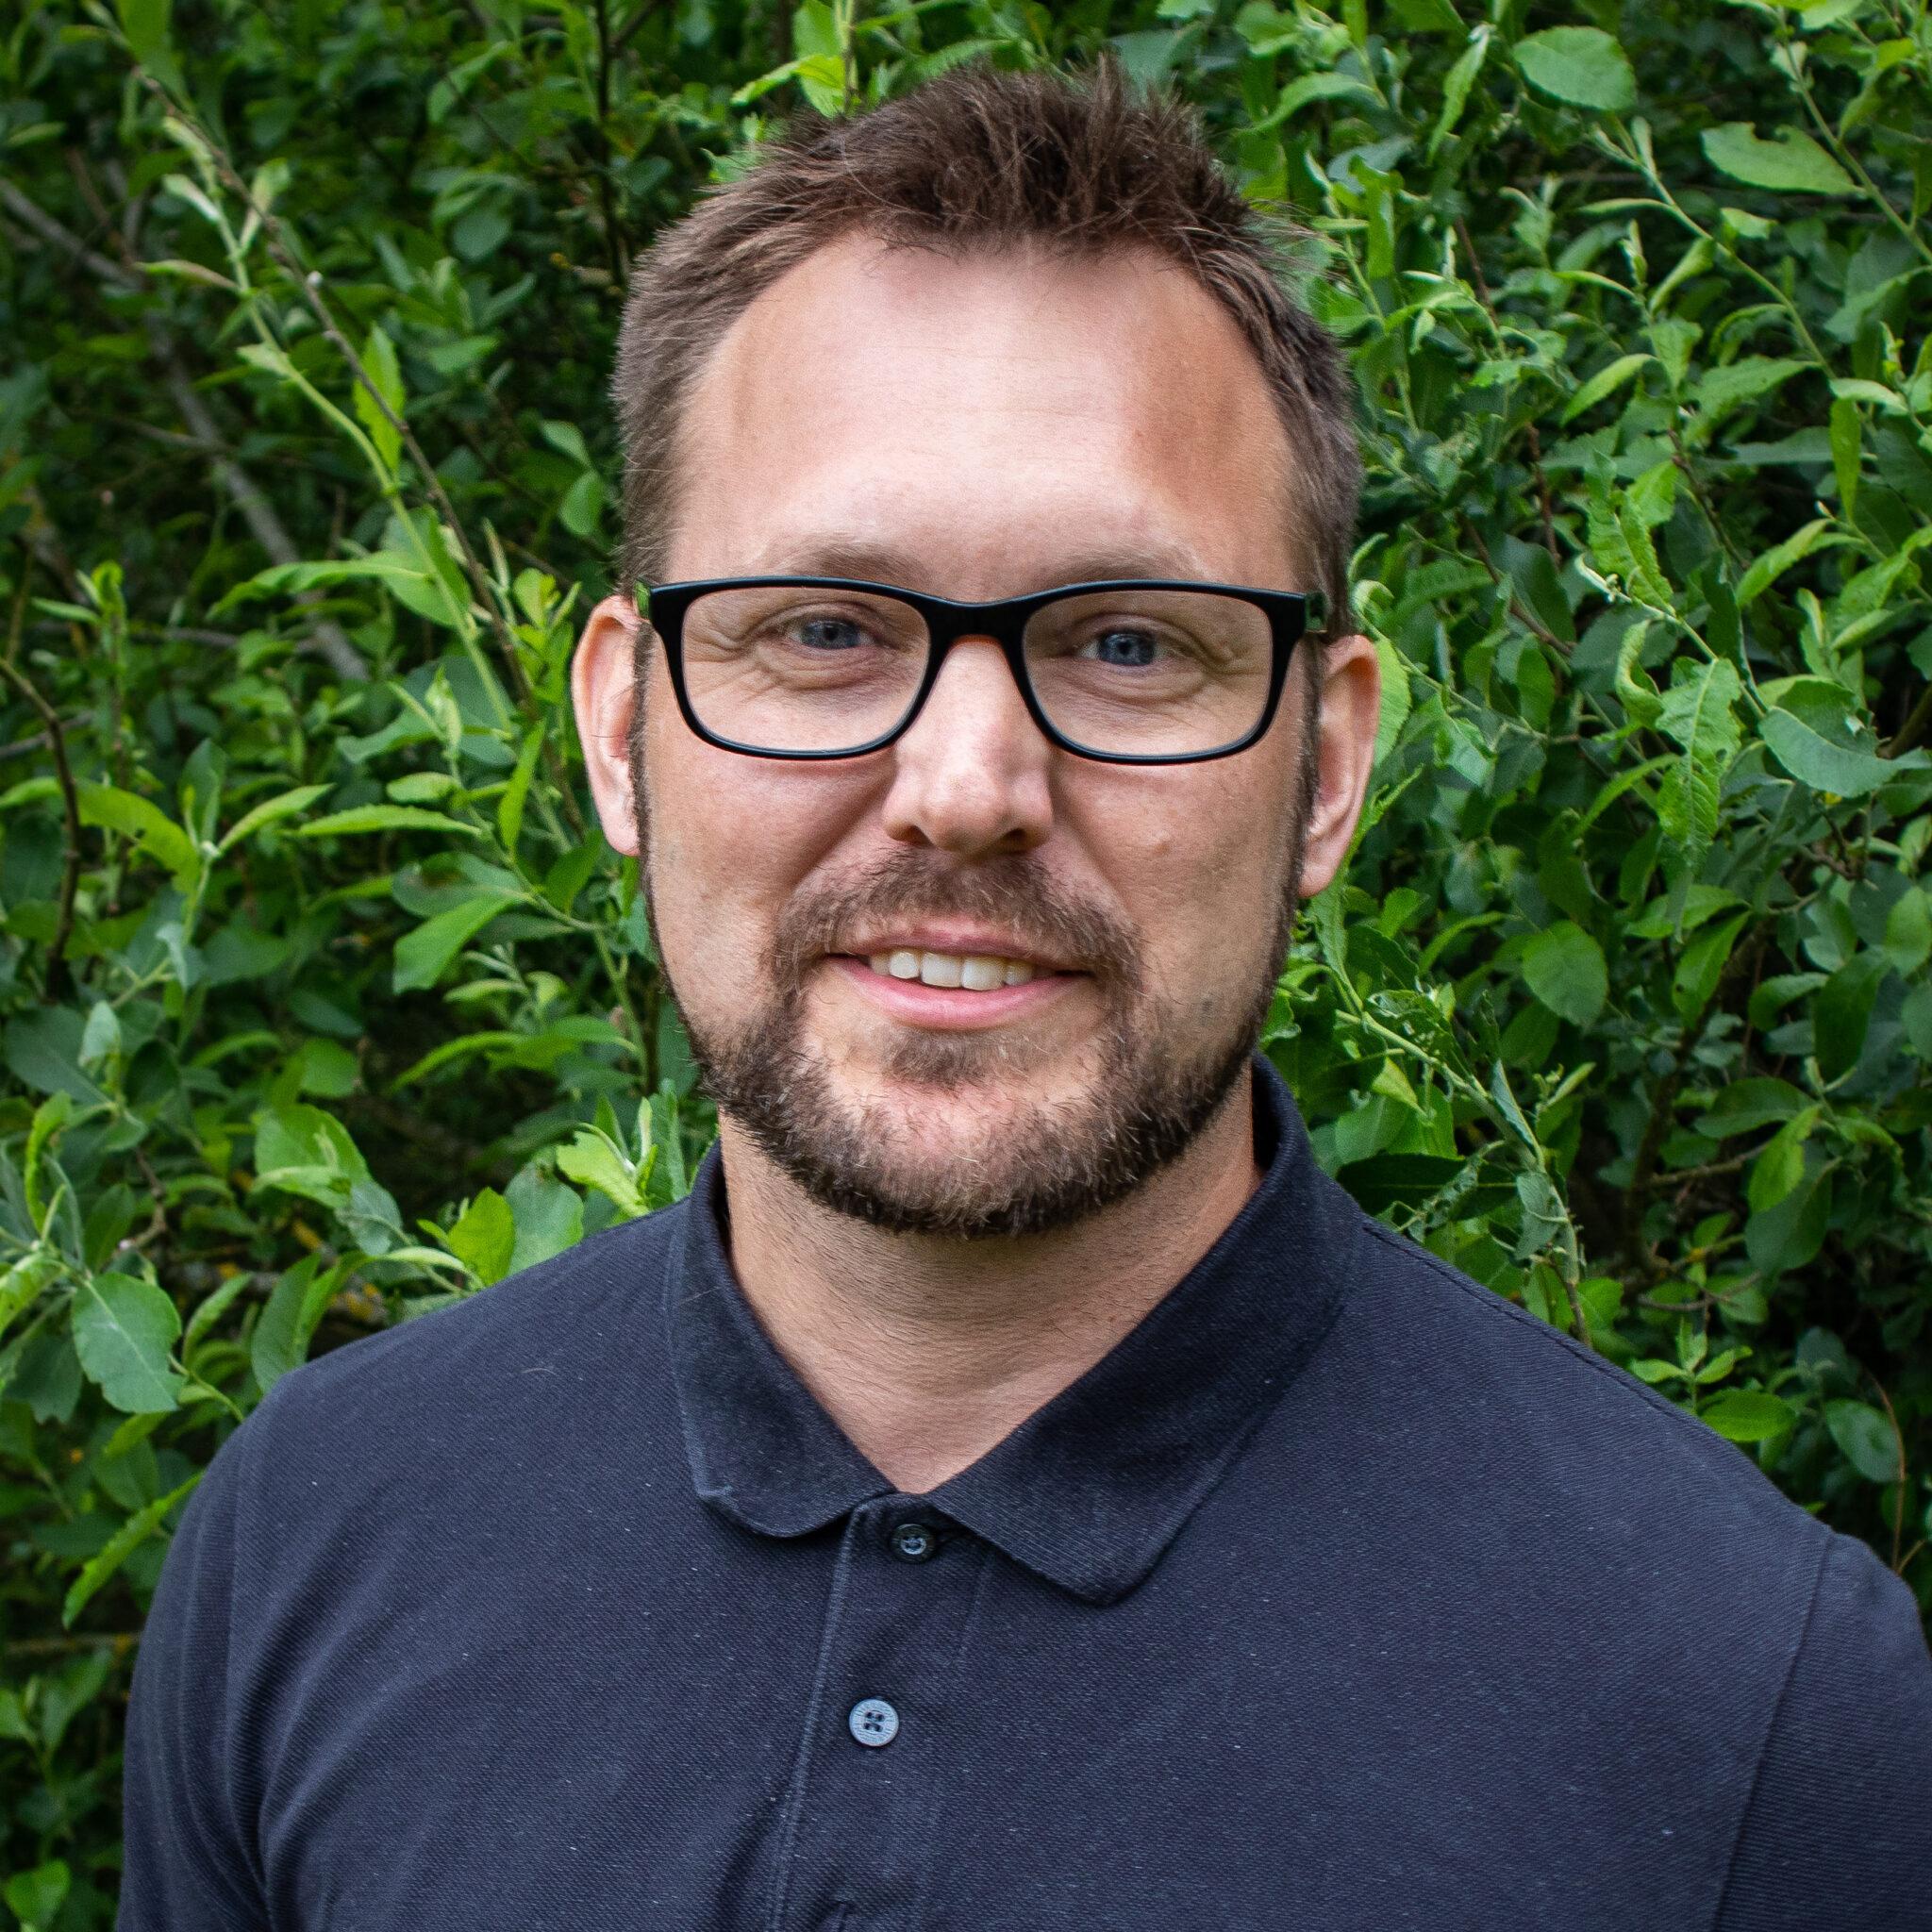 Picture of Simon Rossen